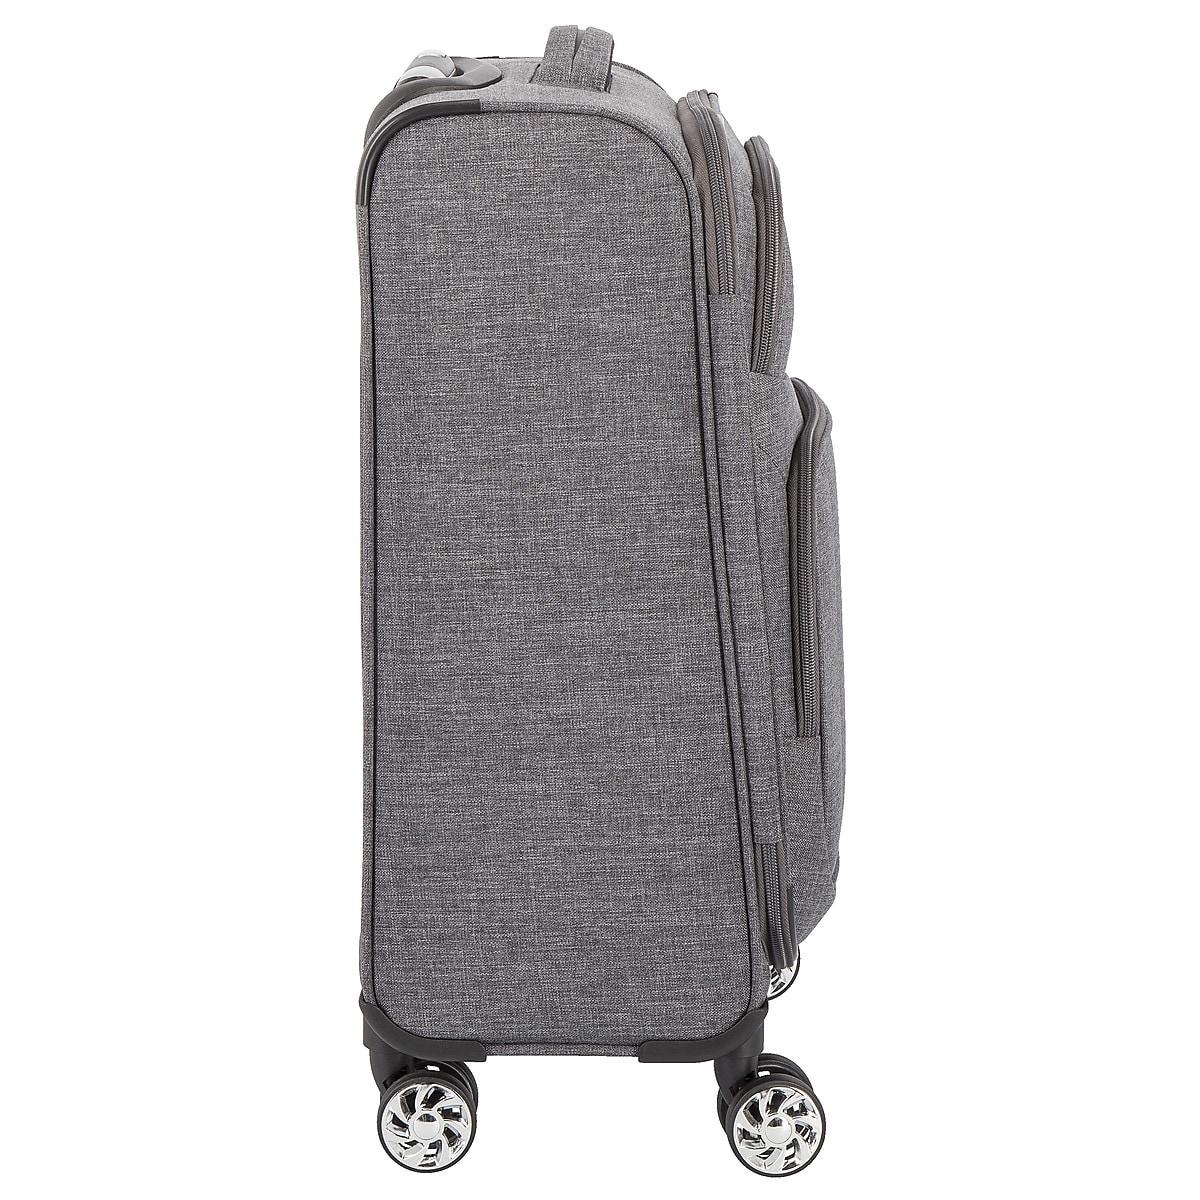 Resväskor 2-pack Asaklitt, grå